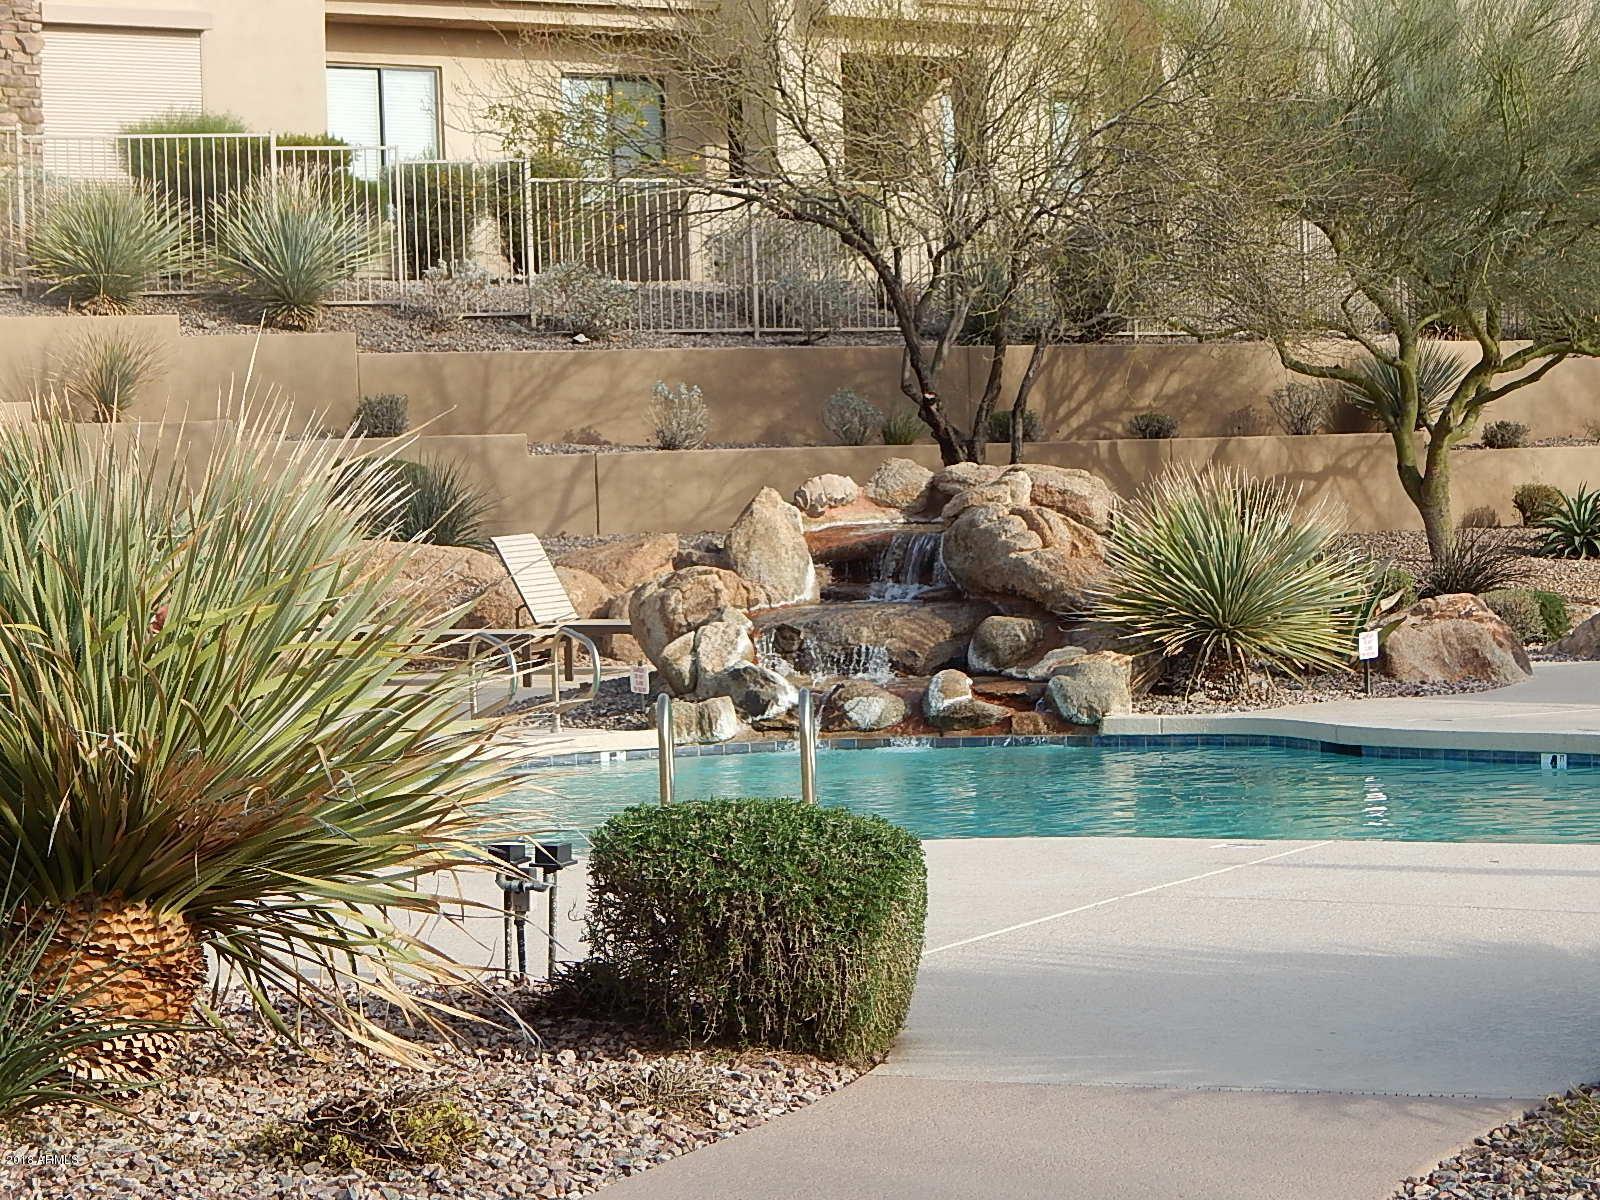 MLS 5814904 7445 E EAGLE CREST Drive Unit 1074, Mesa, AZ Mesa AZ Las Sendas Golf